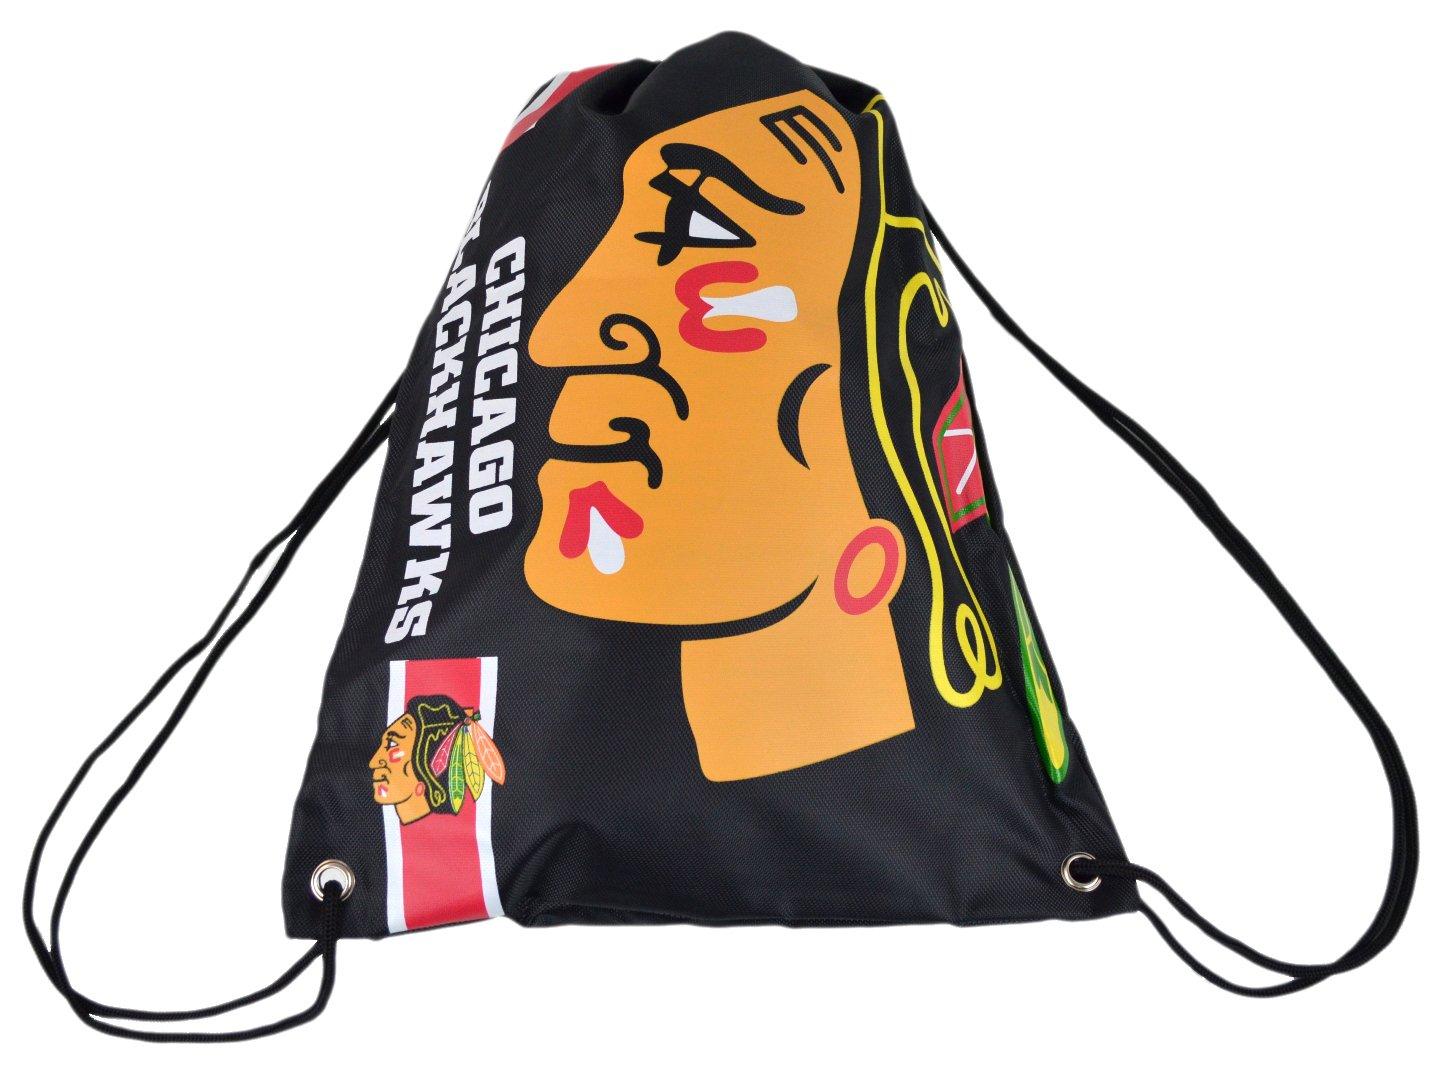 Official National Hockey League Fan Shop Authentic Drawstring NHL Back Sack (Chicago Blackhawks)